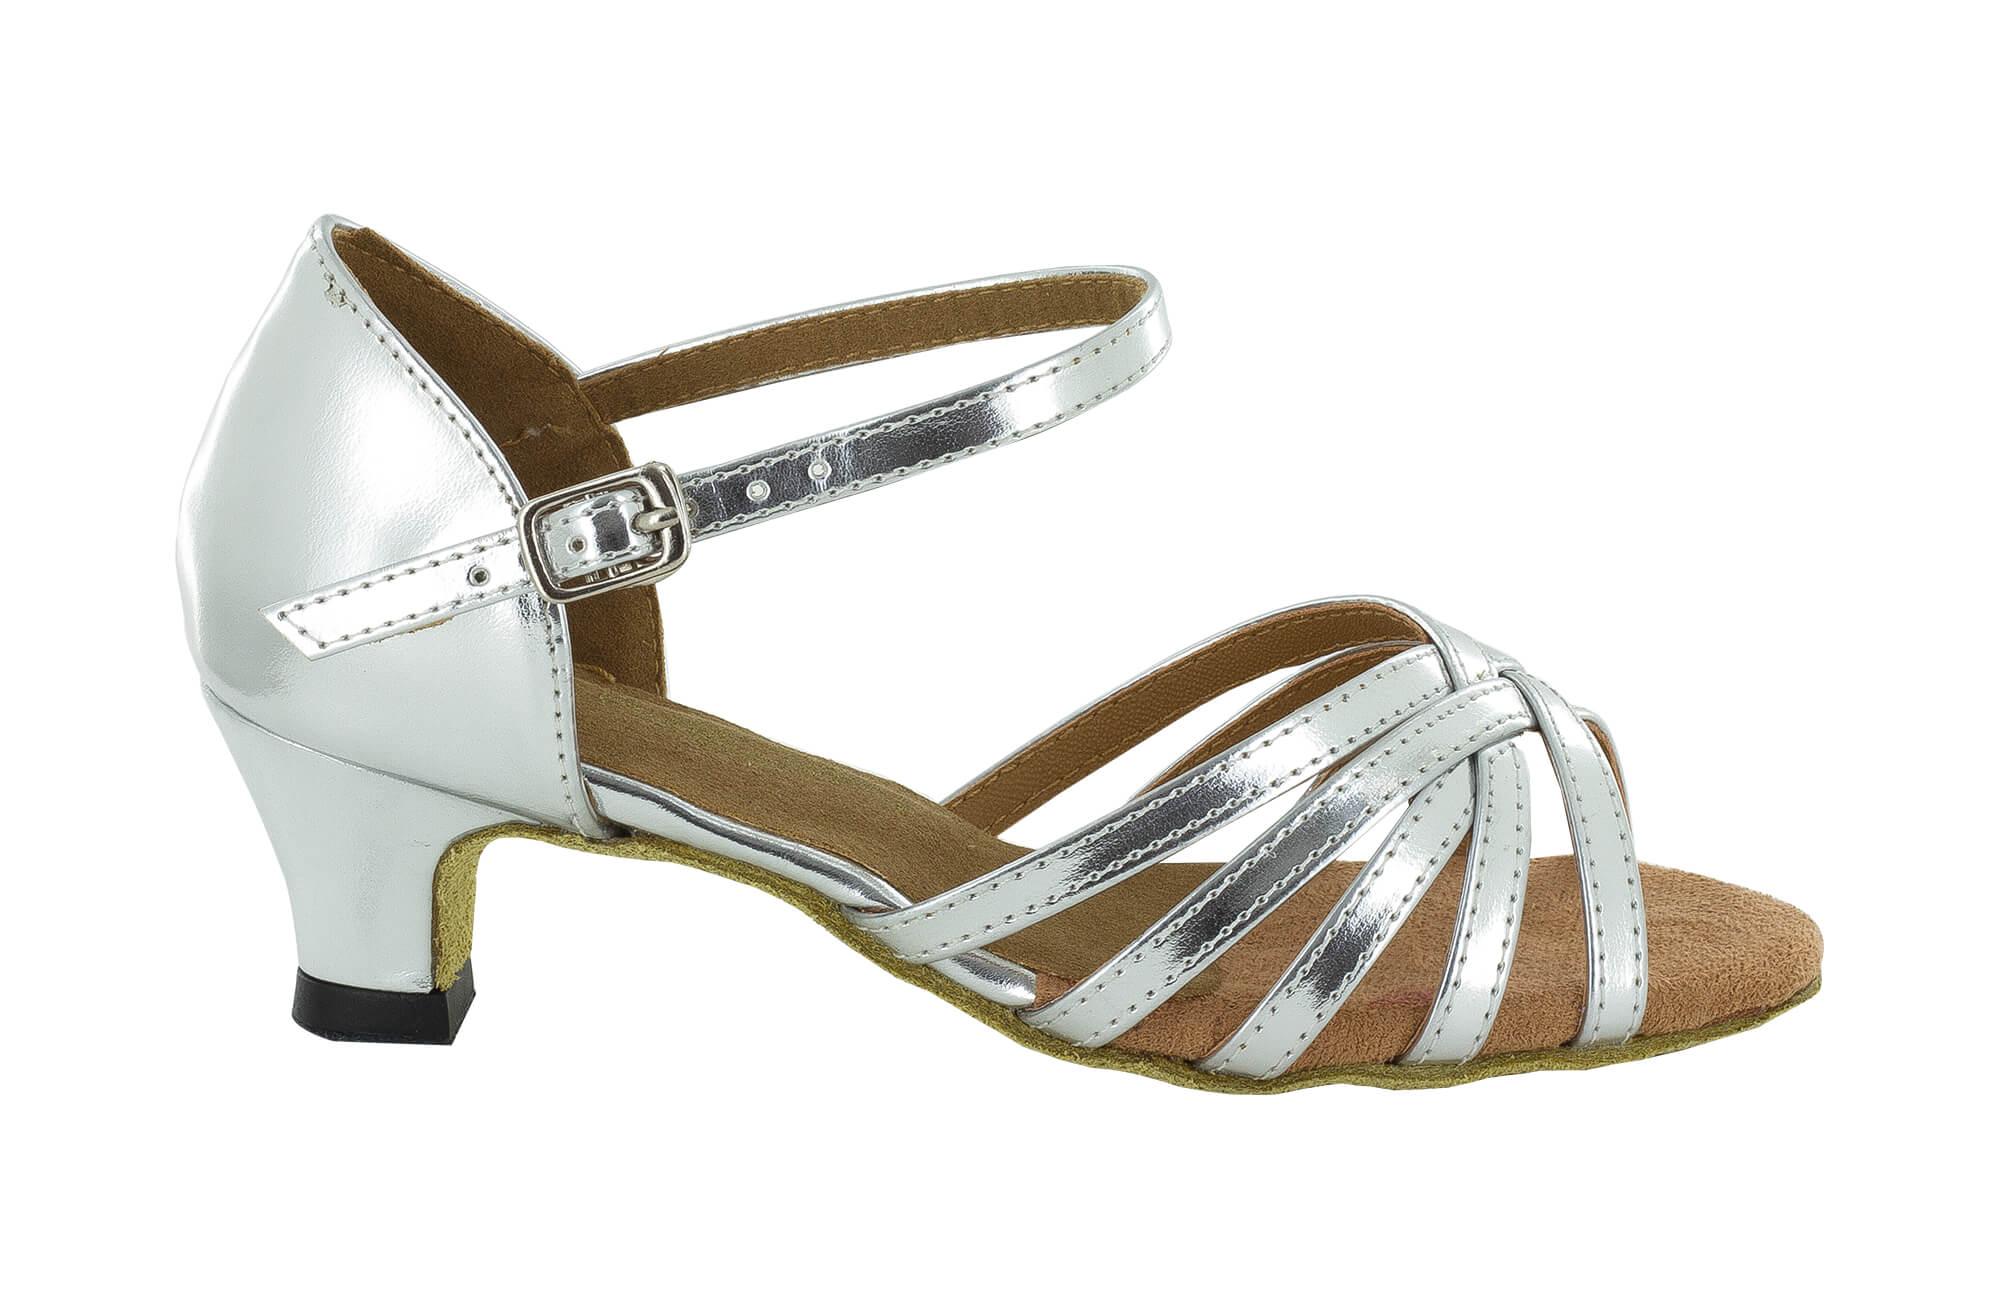 best service 96a38 27d1d Dancing shoes 5 bands silver heel 3,5 cm slim - Dancin scarpe da ballo